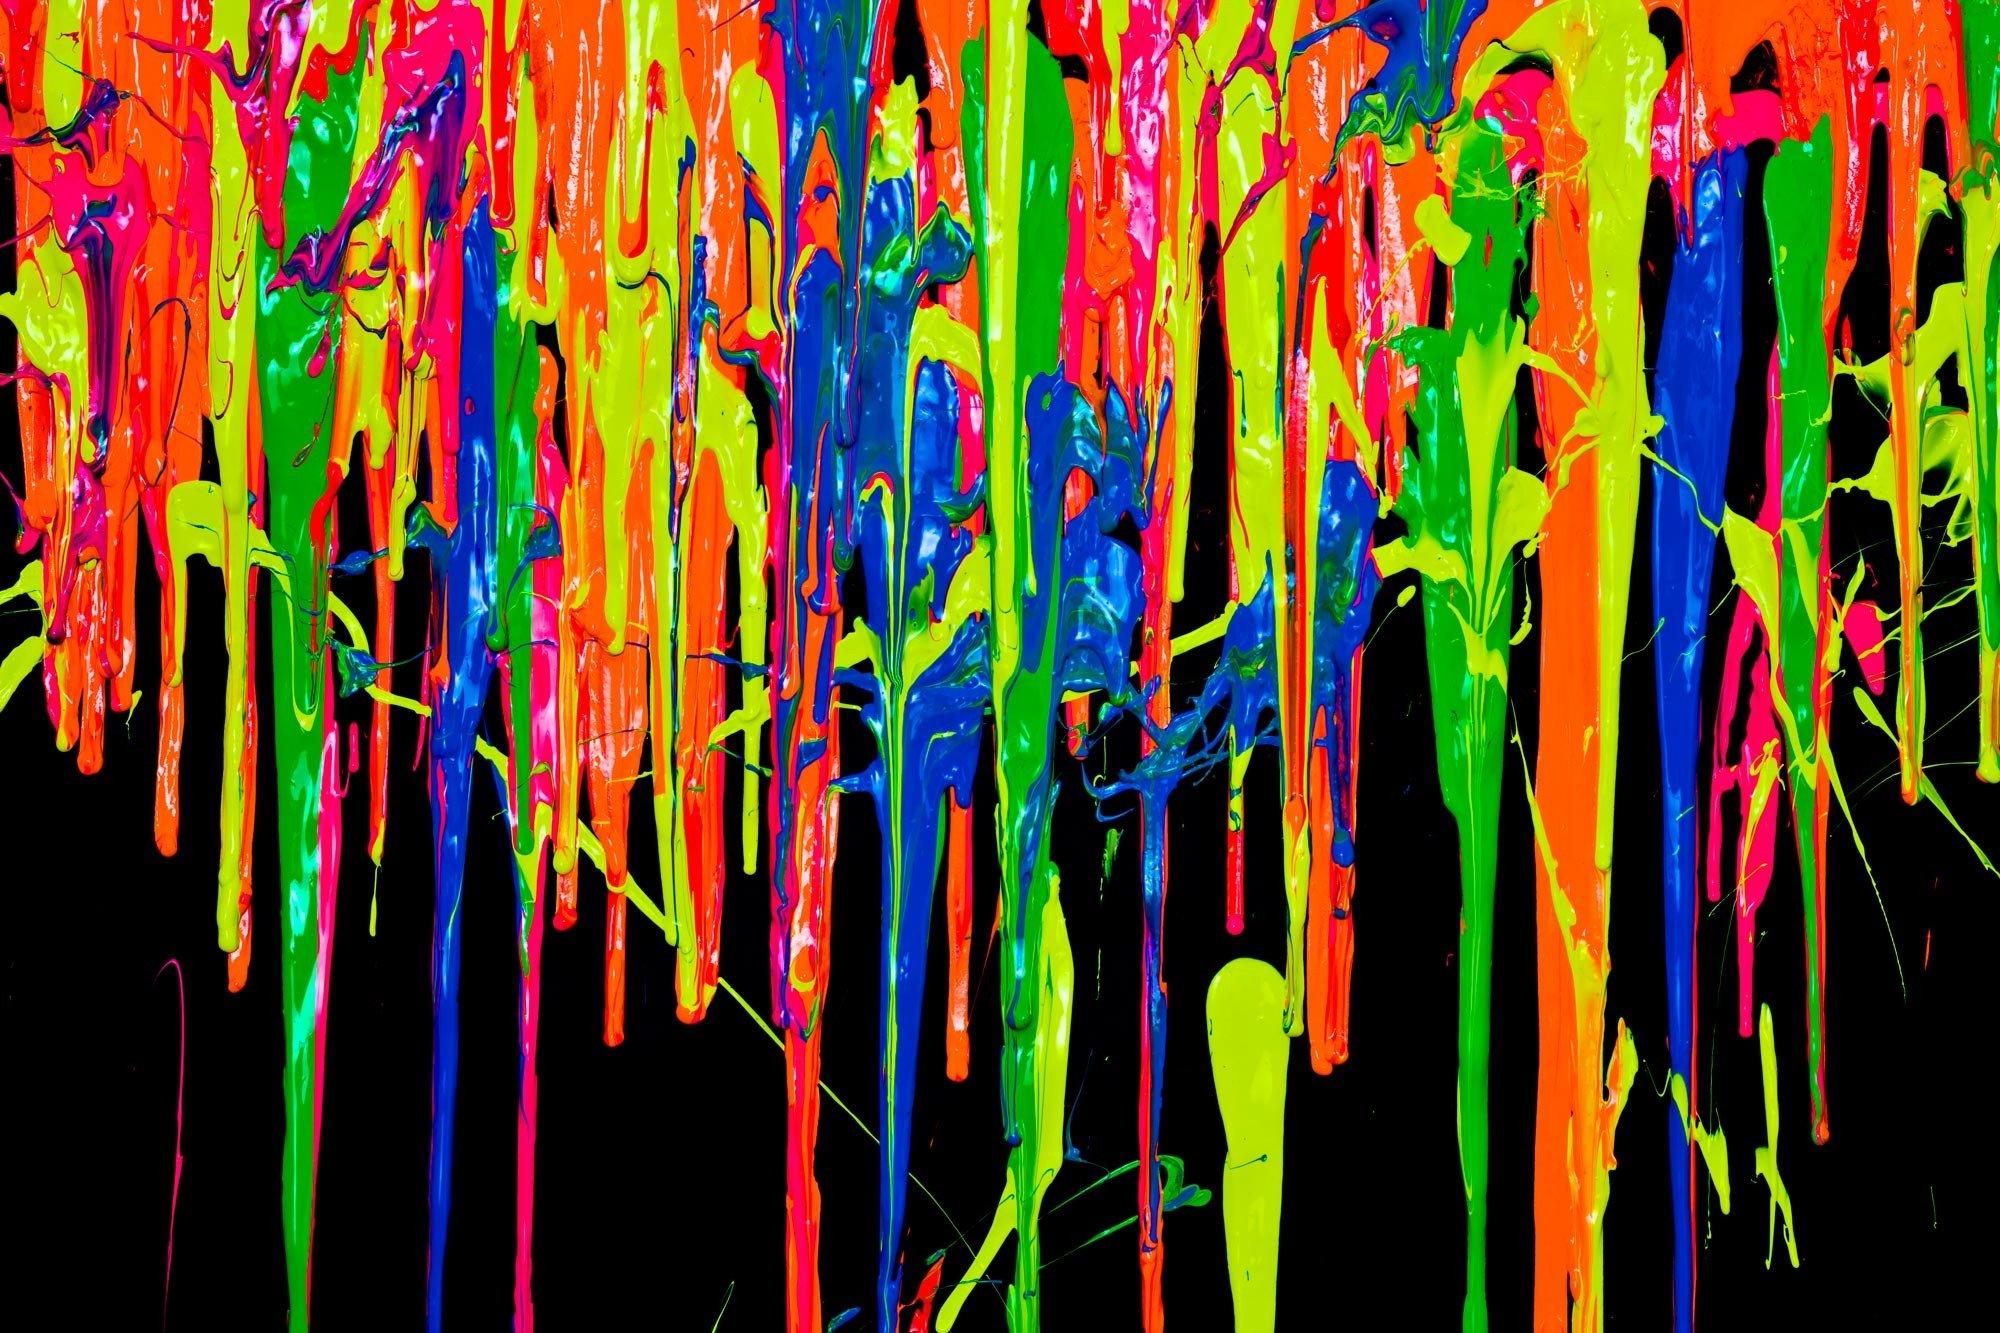 перекусив, картинки с яркими красками на телефон как